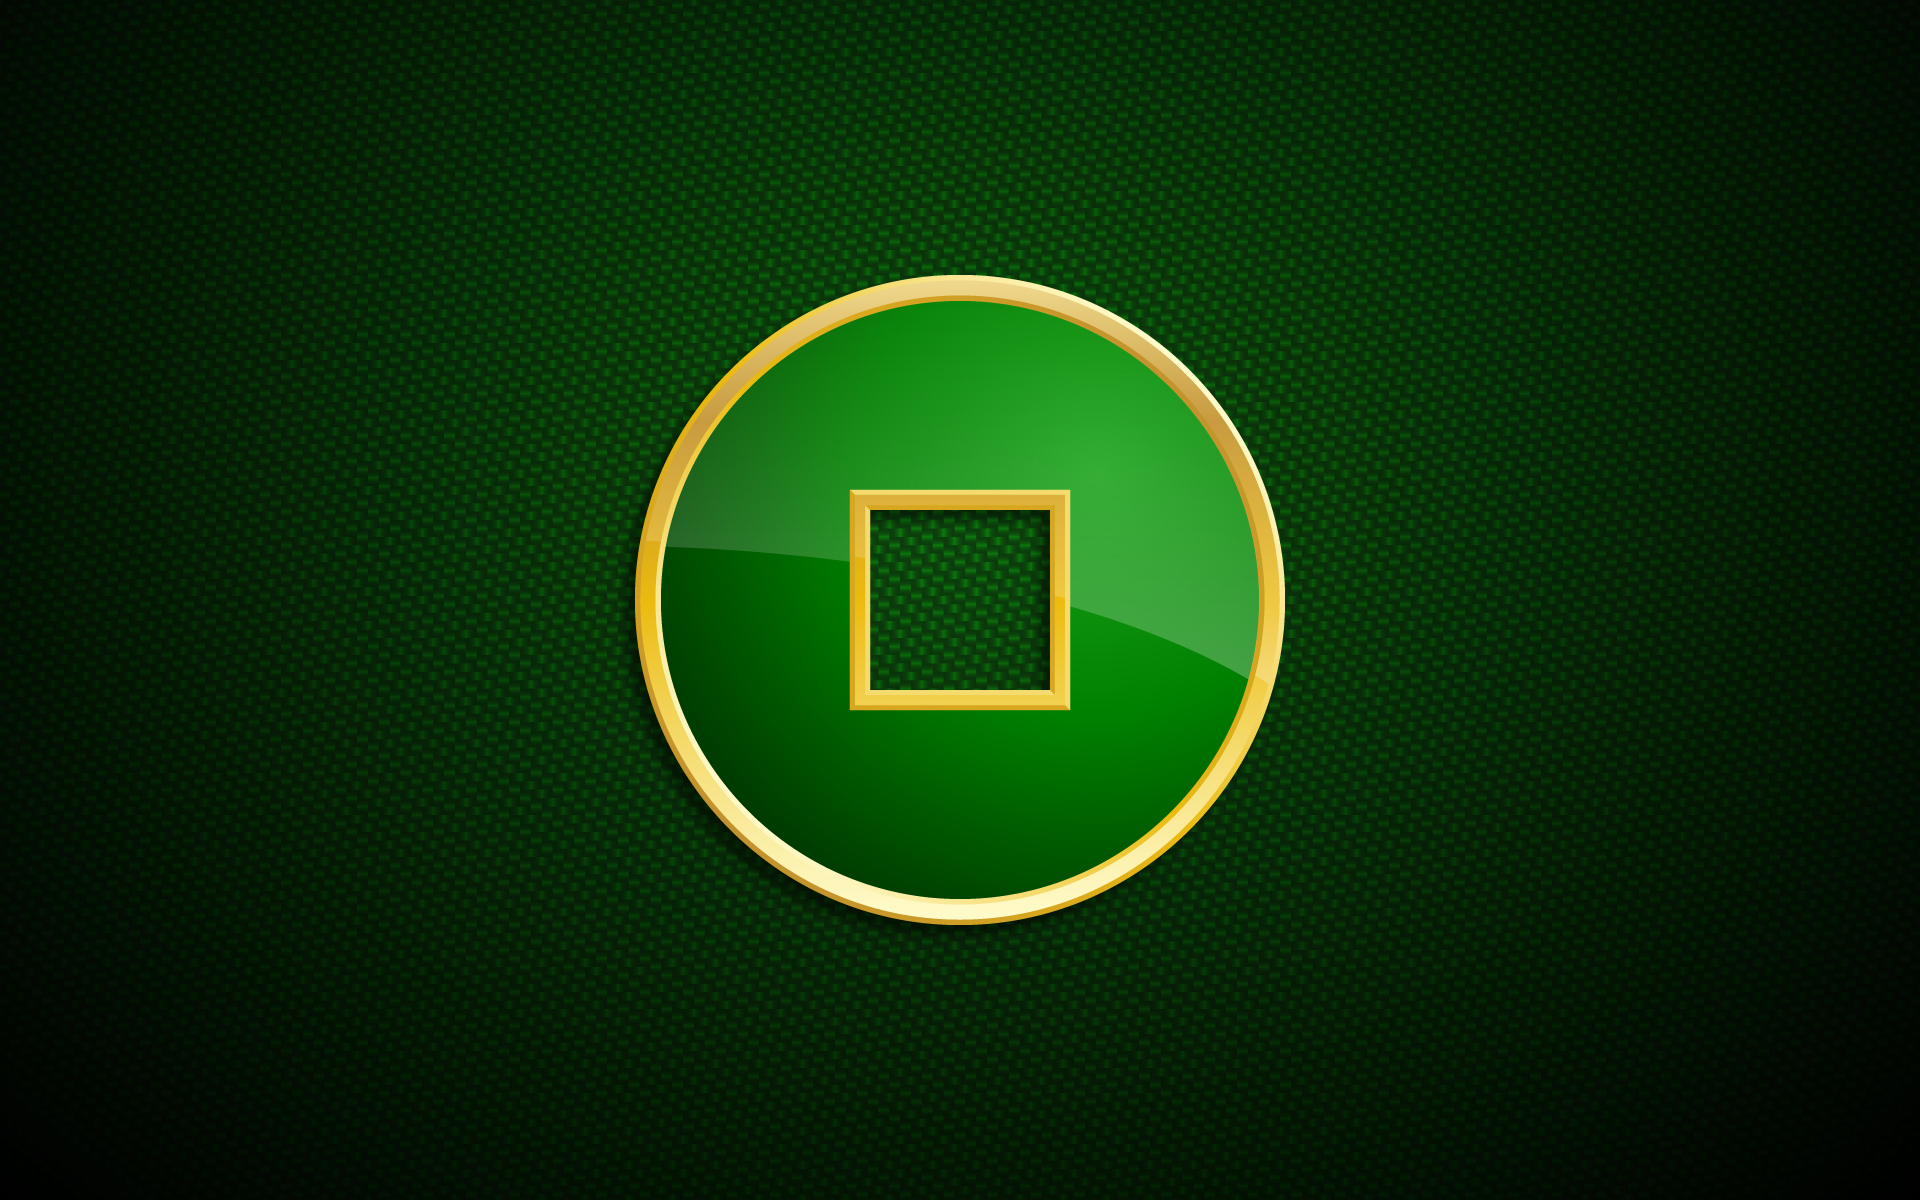 Green Abstract Circles Avatar The Last Airbender Dots Squares Earth